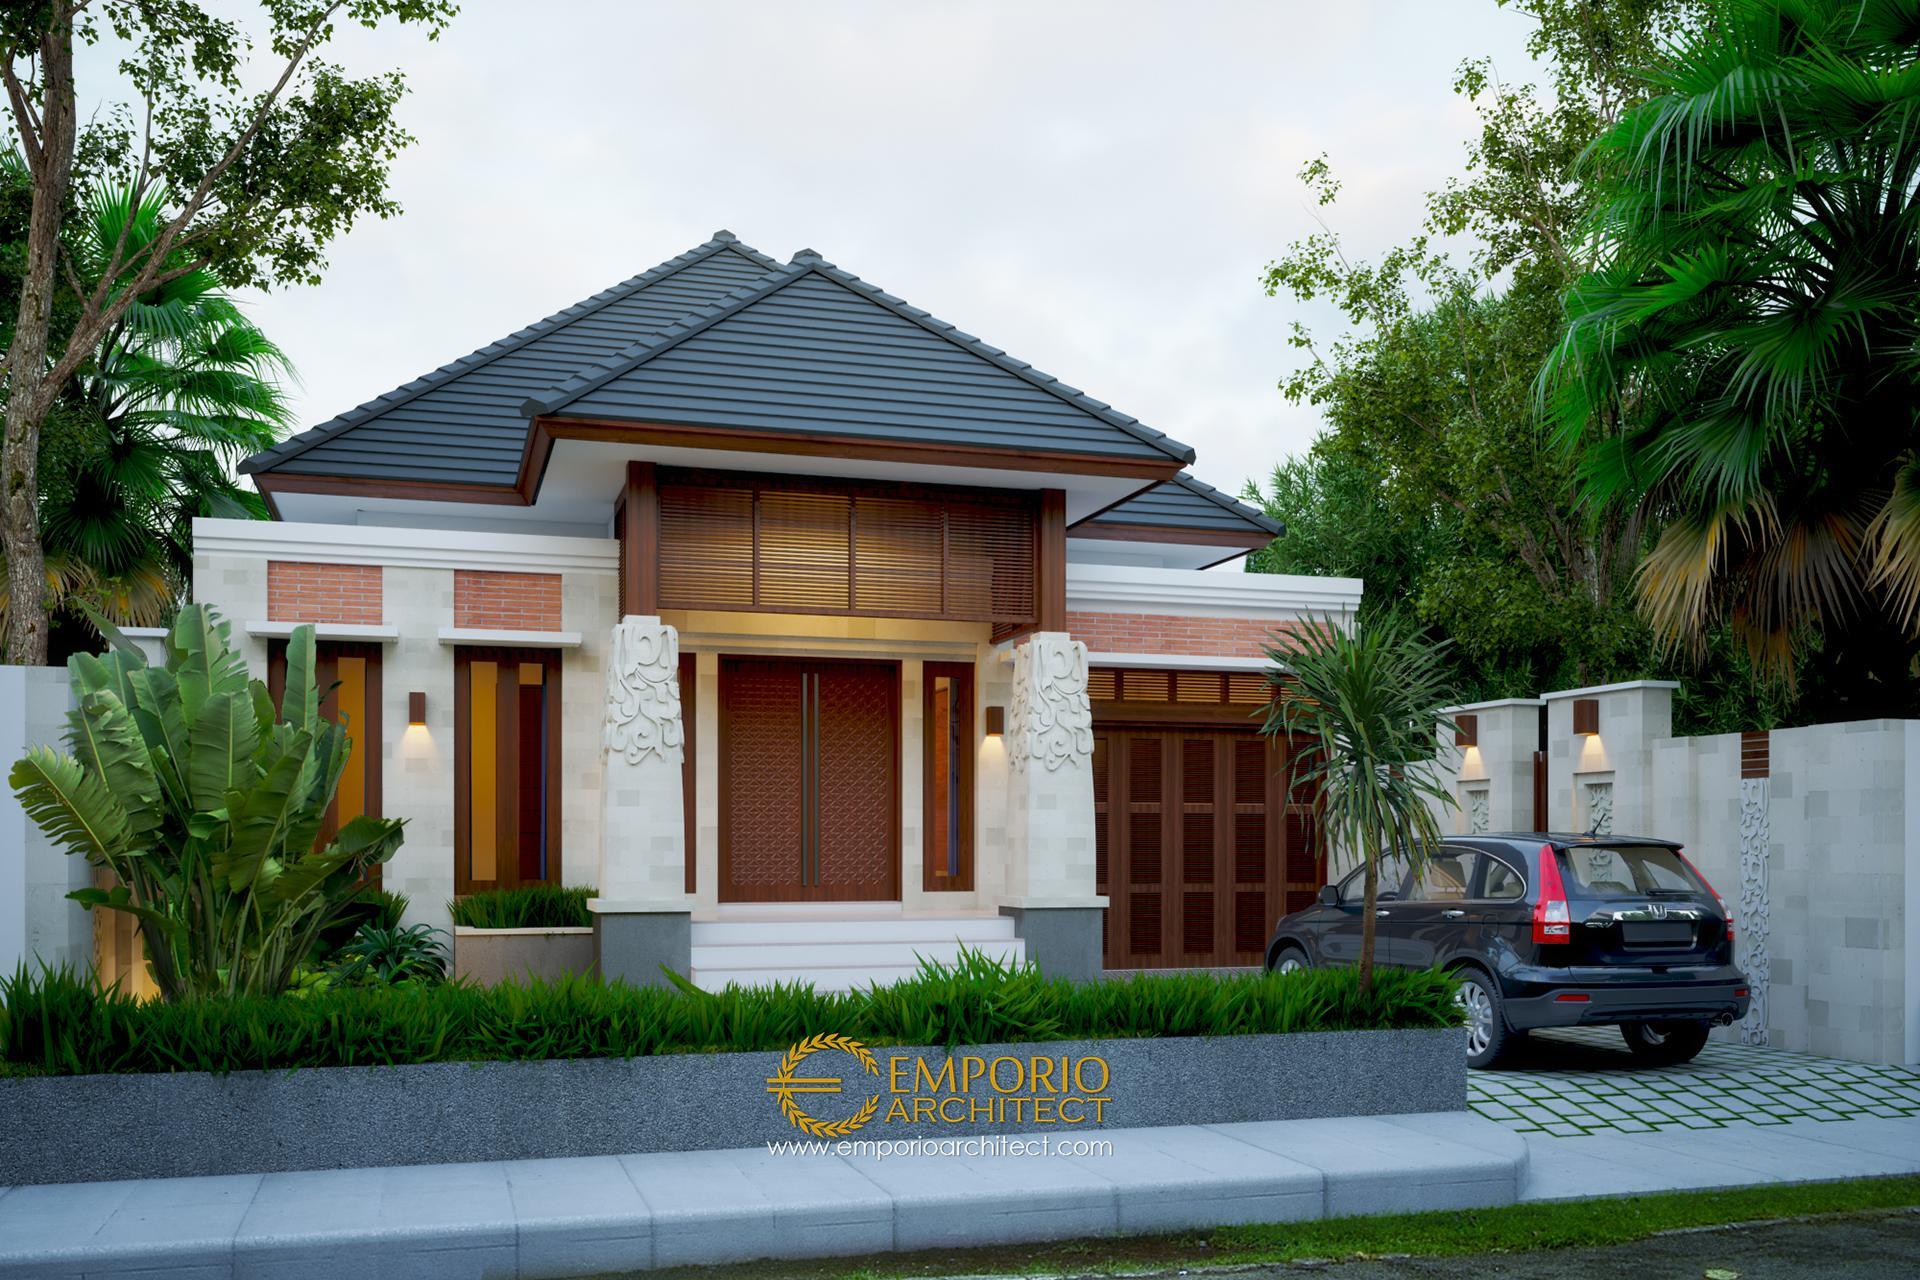 Desain Rumah Villa Bali Tropis 1 Lantai Bapak Ammal Rozib di  Sumatera Selatan